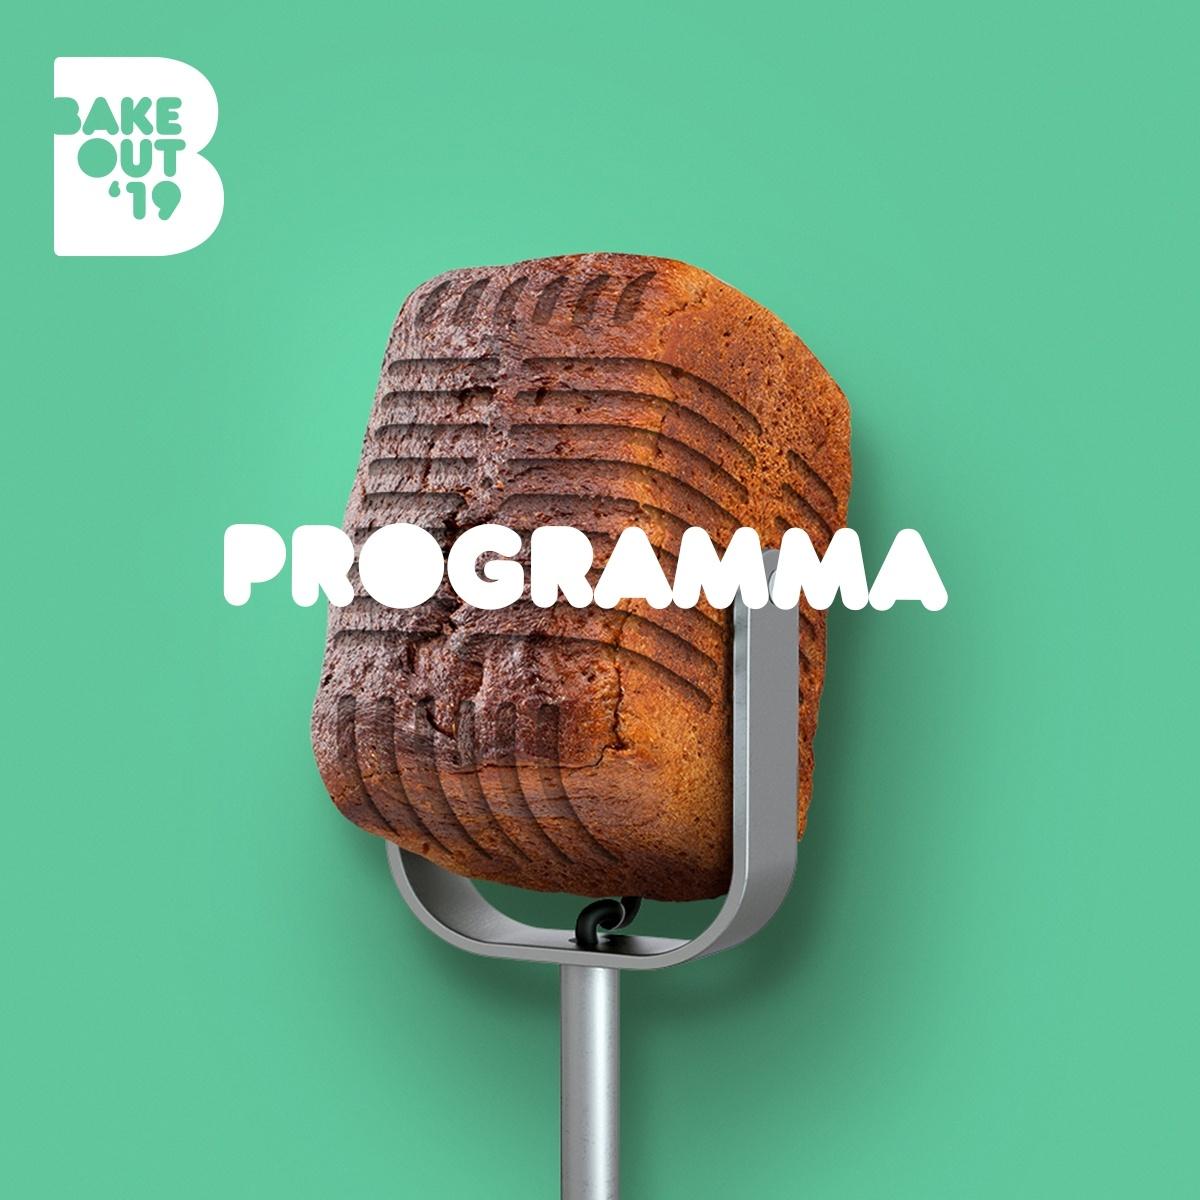 Bake Out 2019 programma